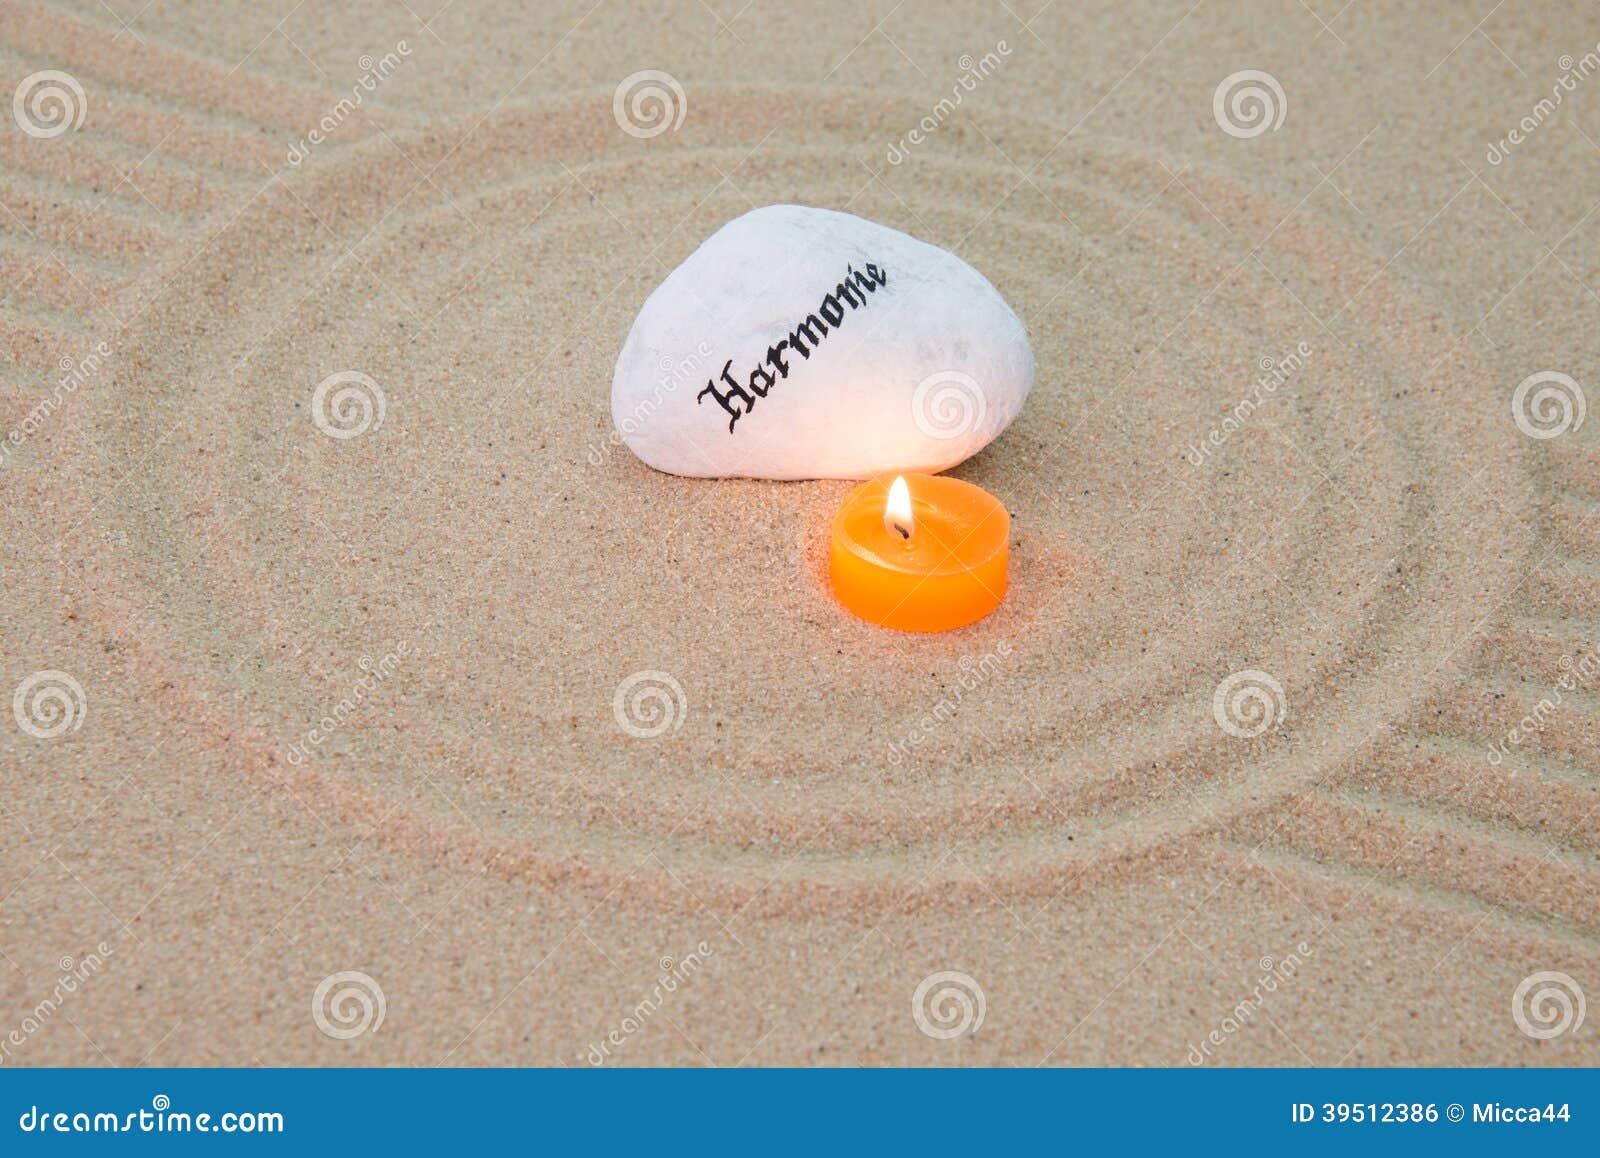 Stone onto sand